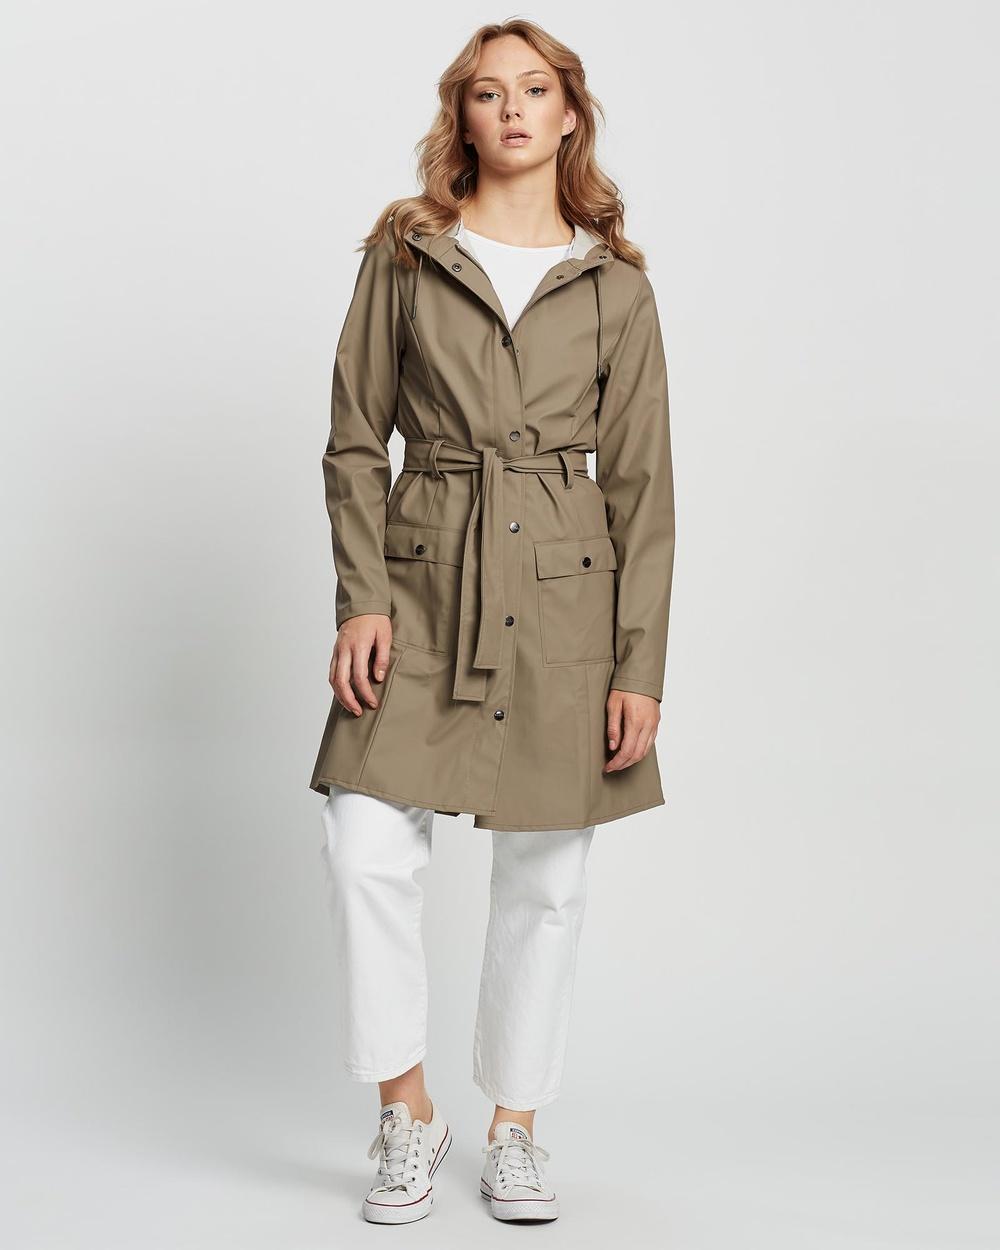 RAINS Curve Jacket Accessories Taupe